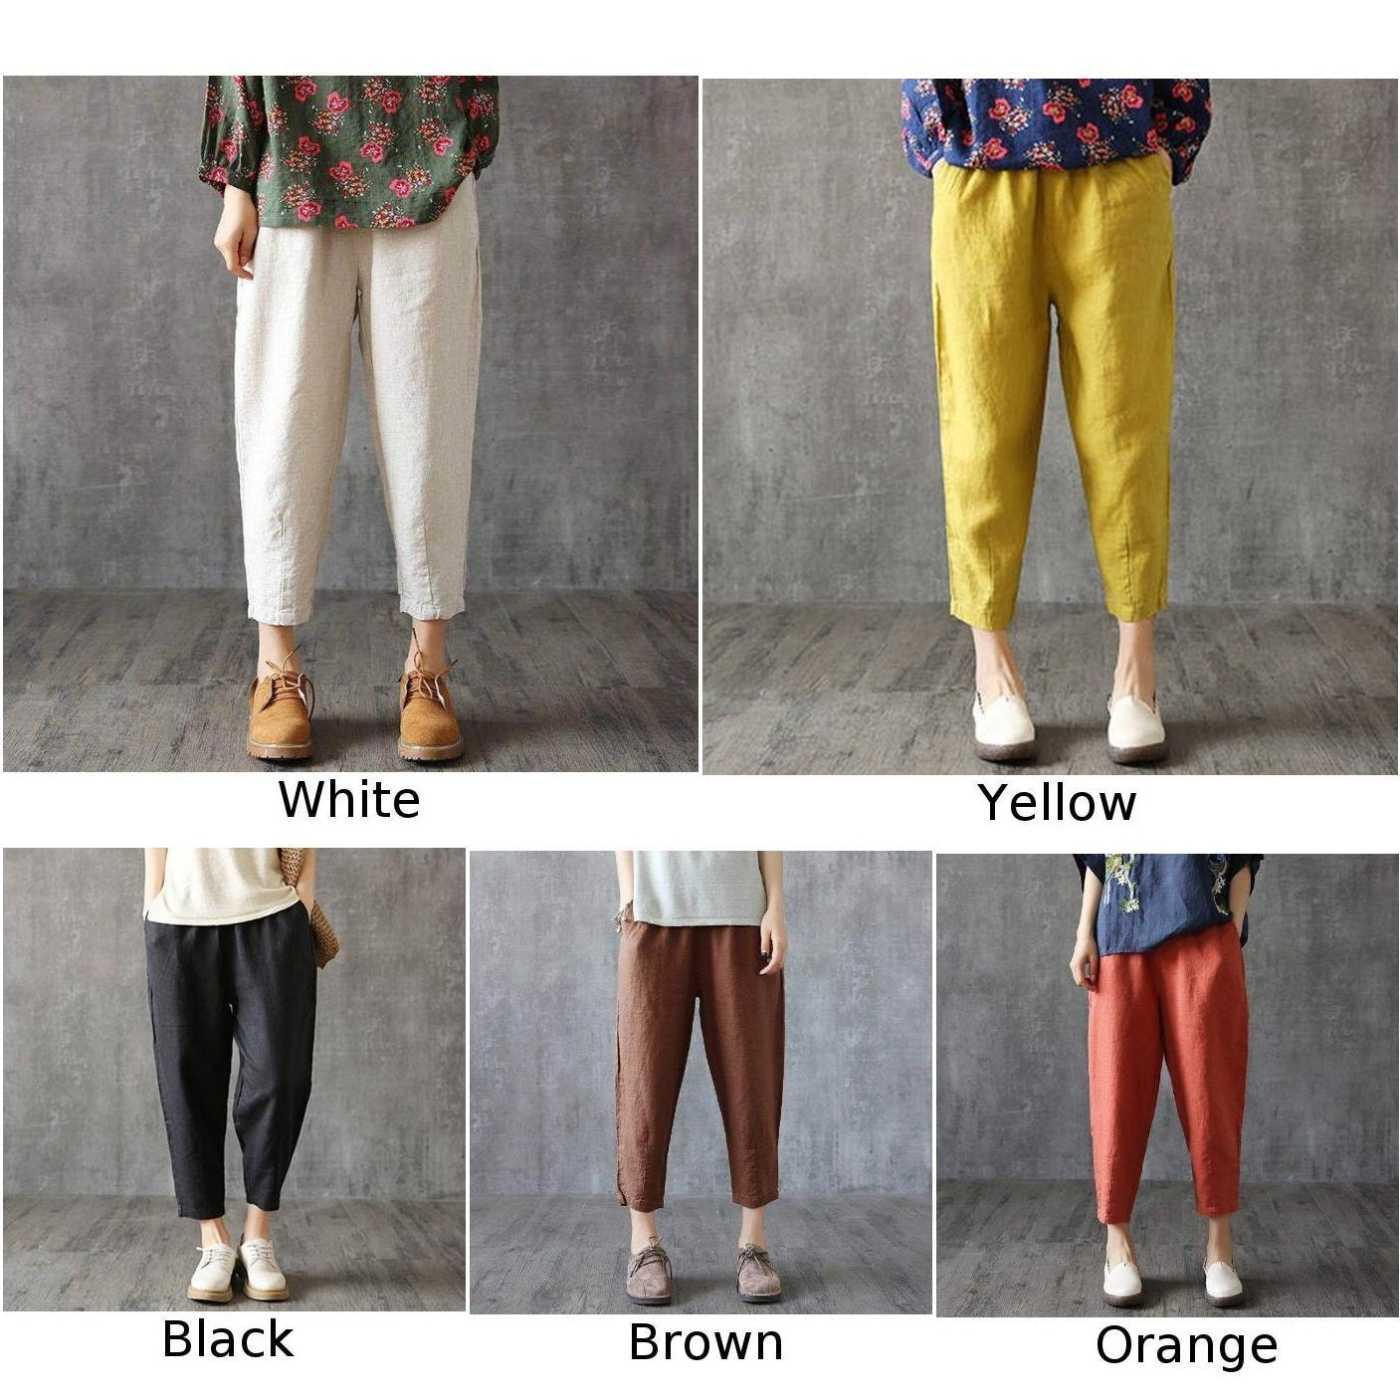 3dc0d73602 ... Women Casual Loose Solid Color Cotton Baggy Trousers Plus Size Spring  Summer Harem Pants